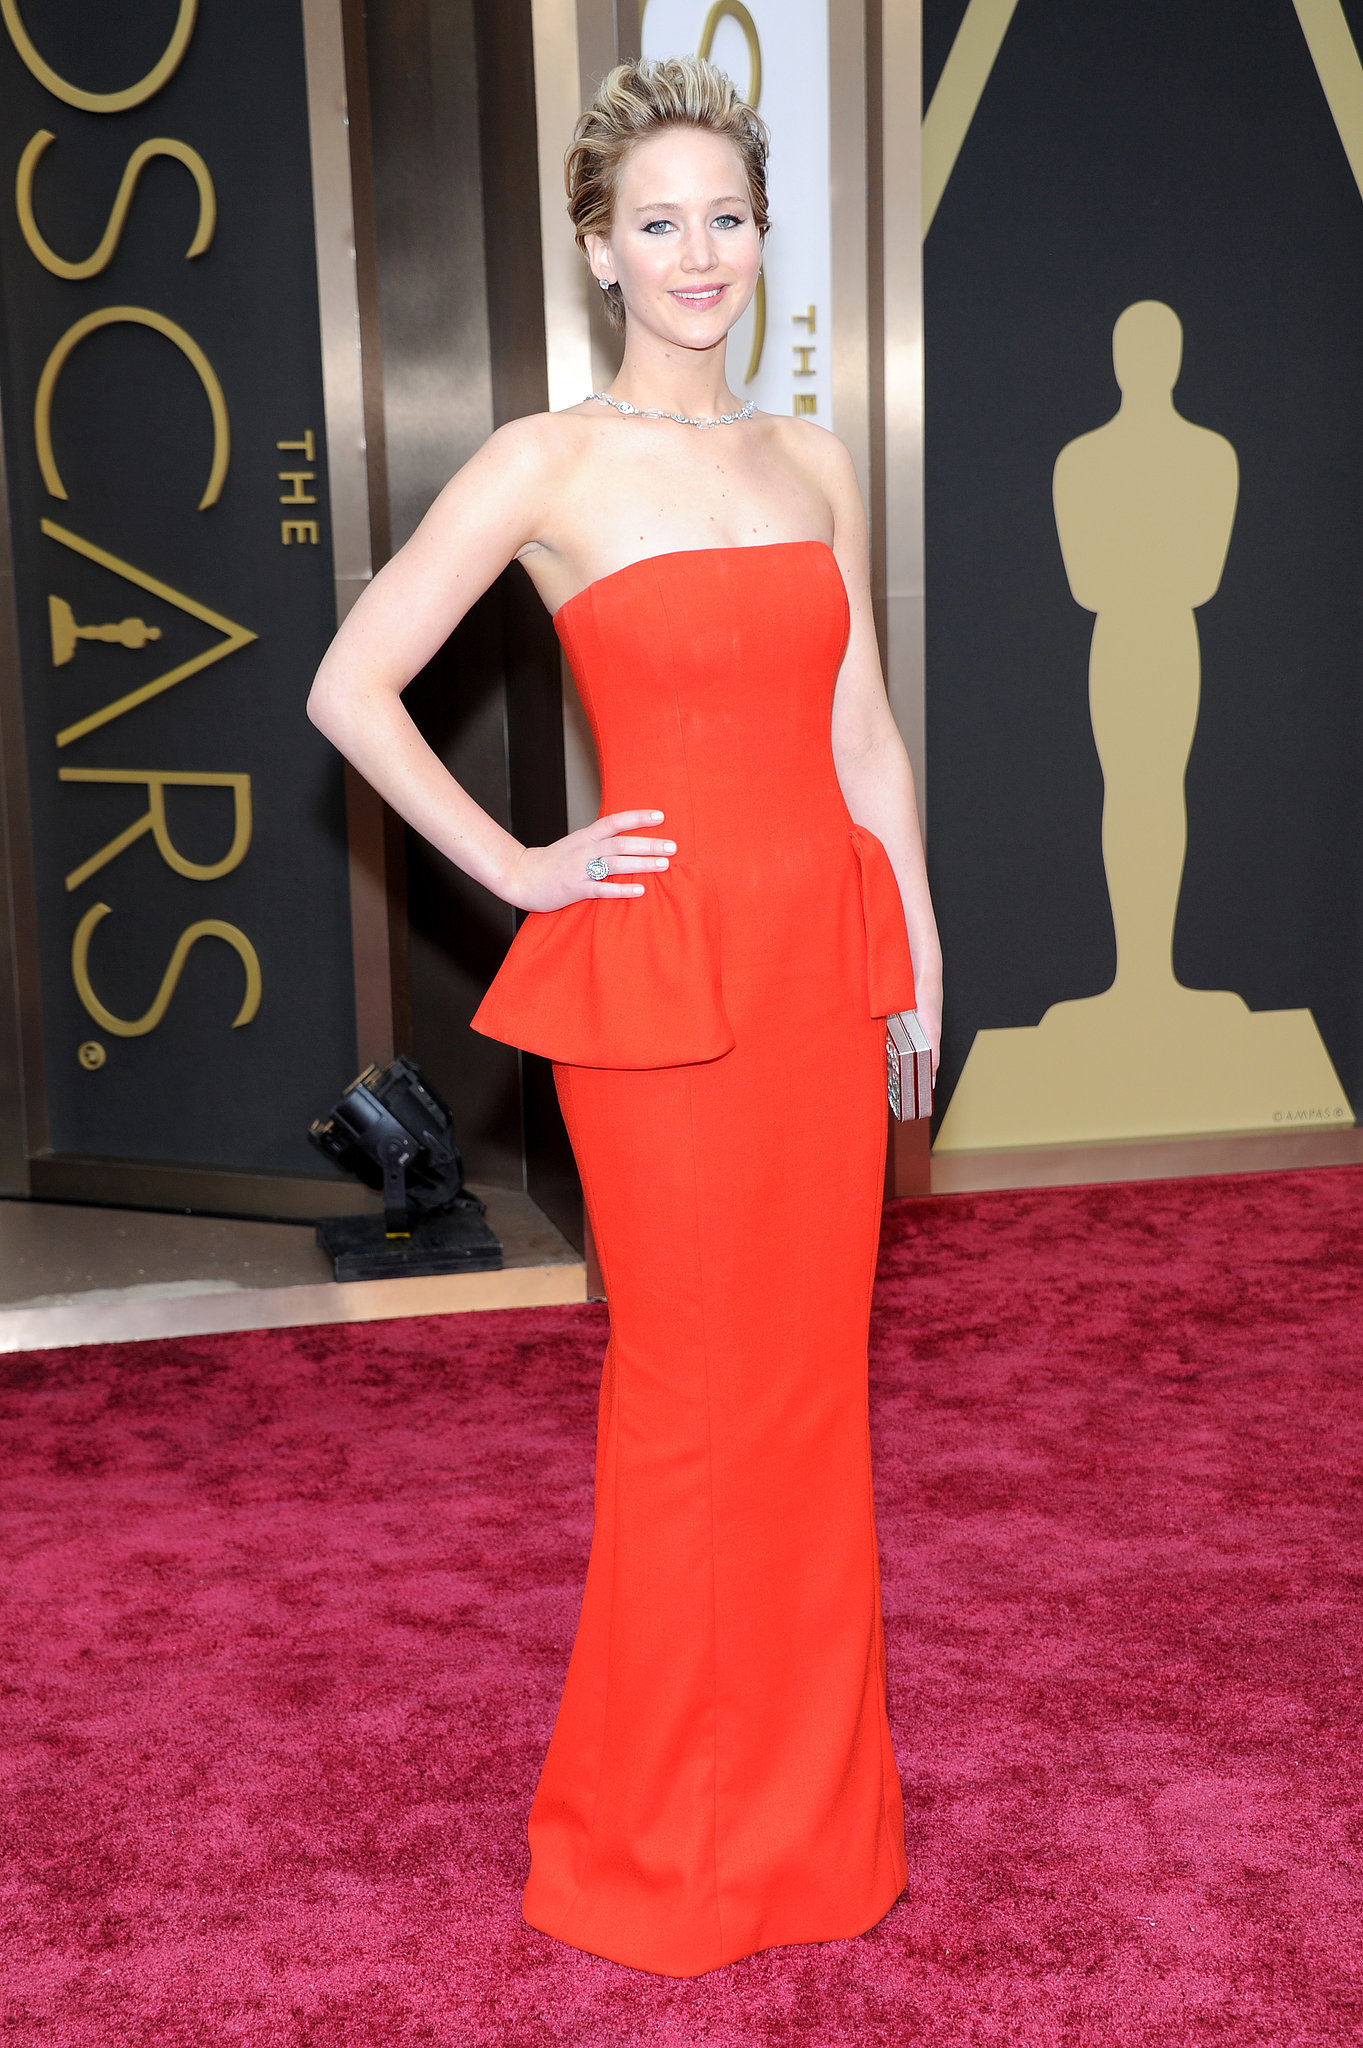 Vẽ Jennifer Lawrence tại lễ trao giải Oscar 2014